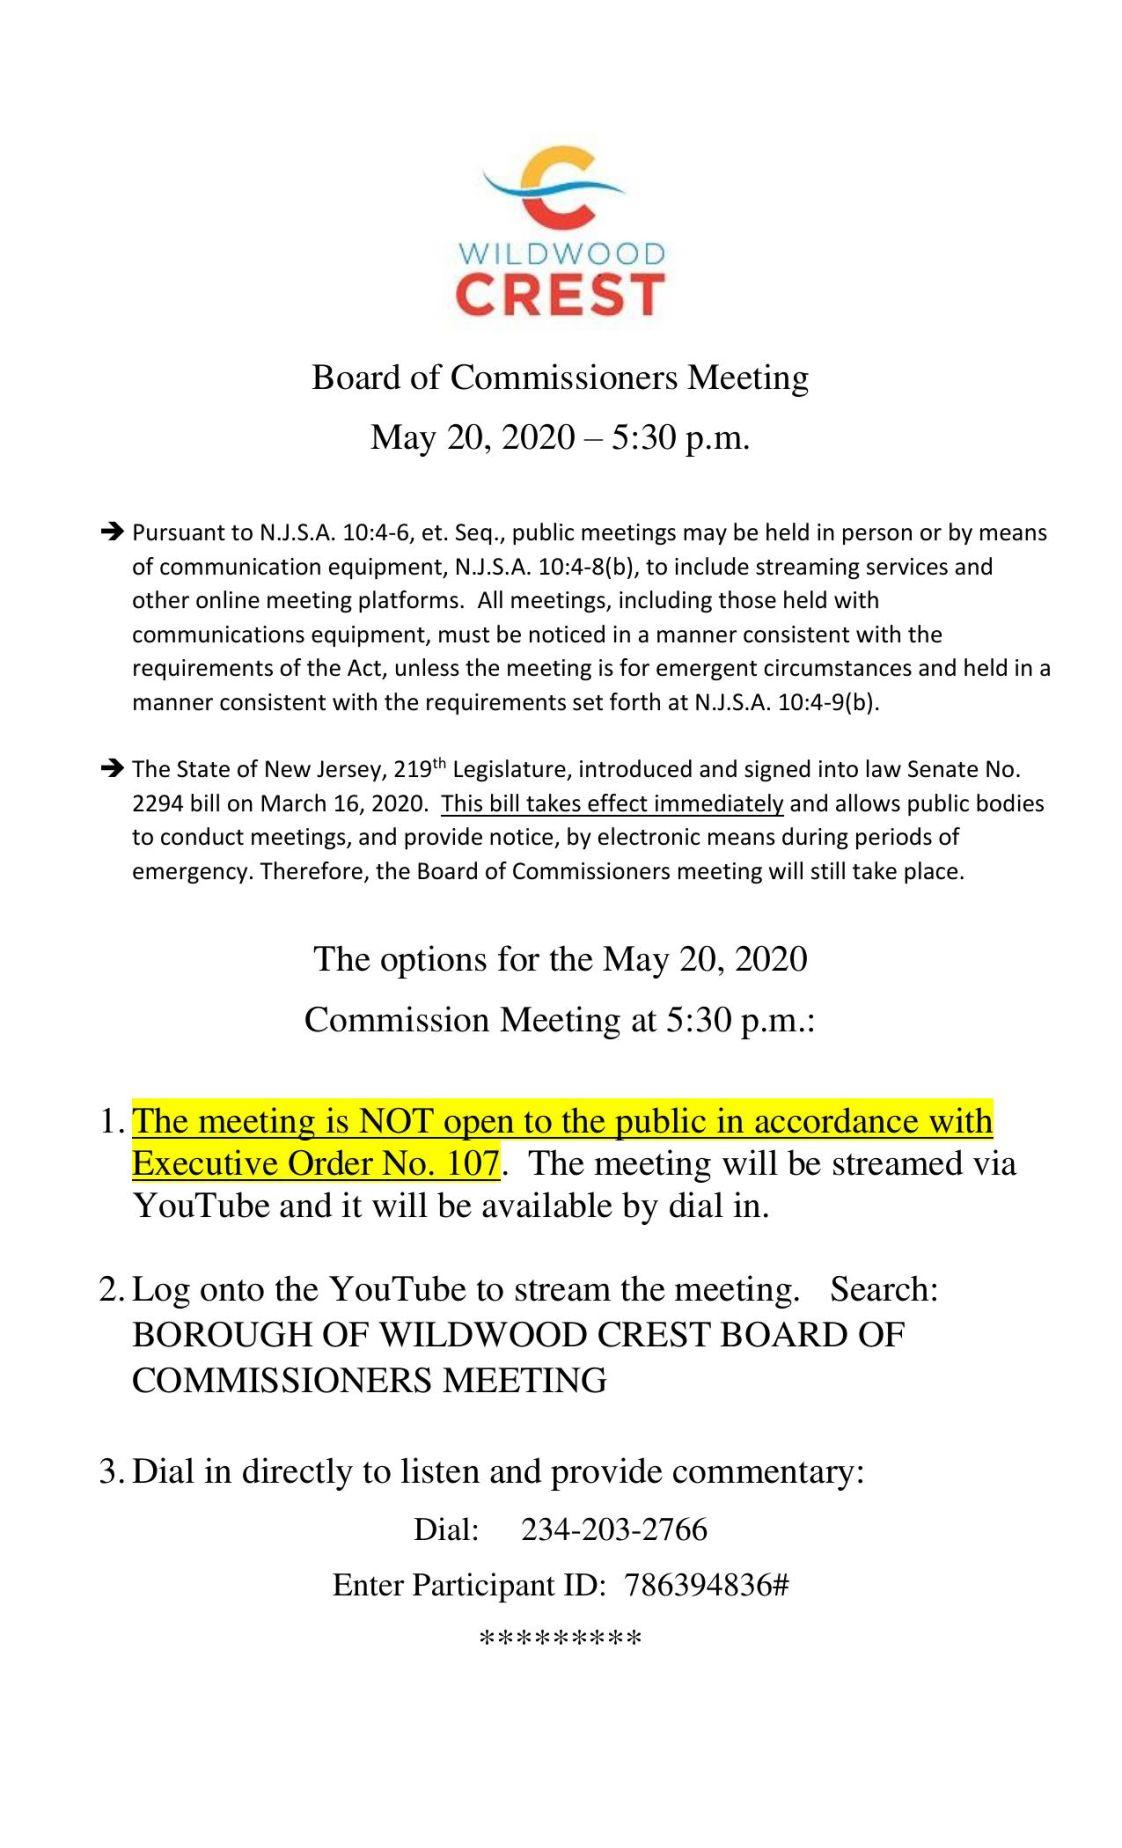 Wildwood Crest Commissioners Meeting Agenda 5-20-20